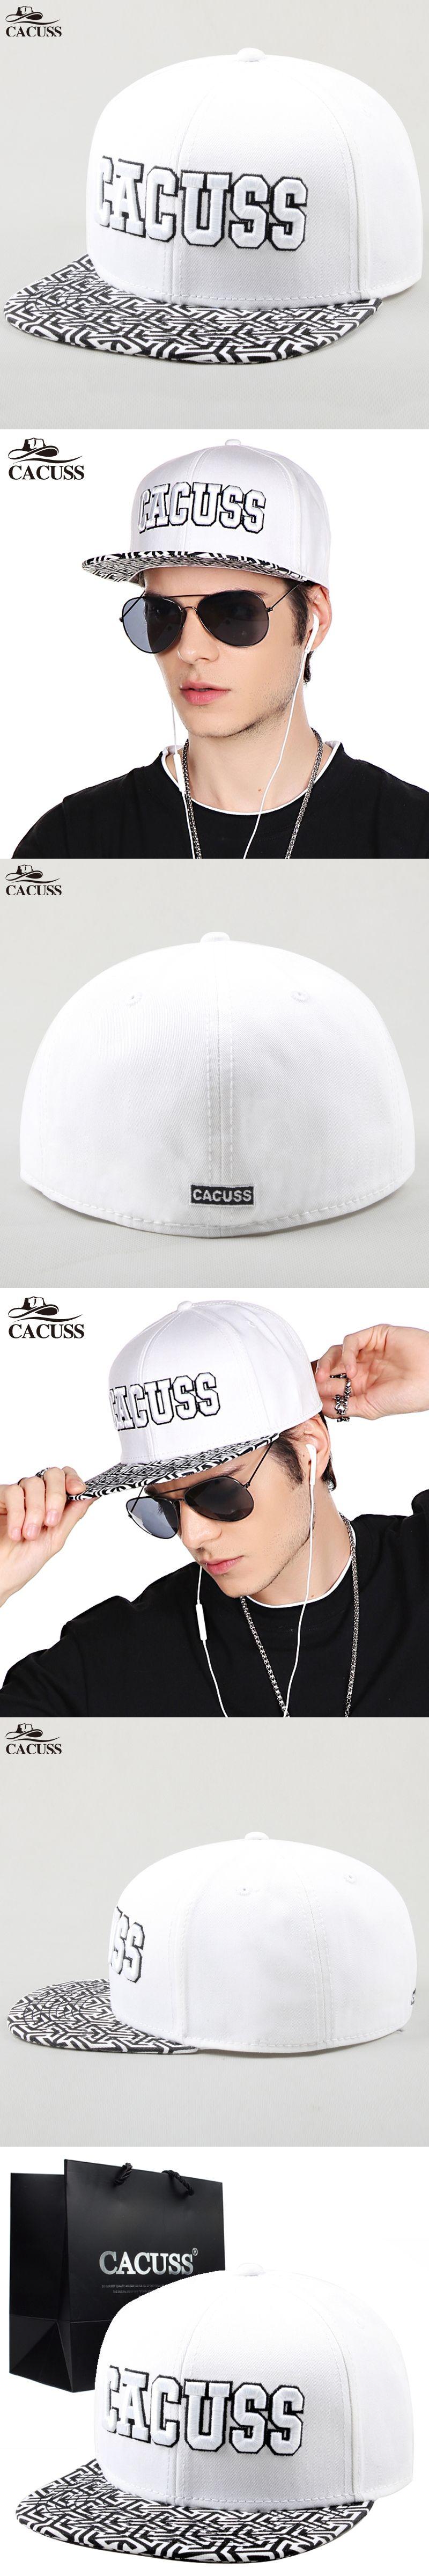 b9fd5edcfc0 wholesale baseball caps high quality hip hop hats white summer hats girl  boys men women casual